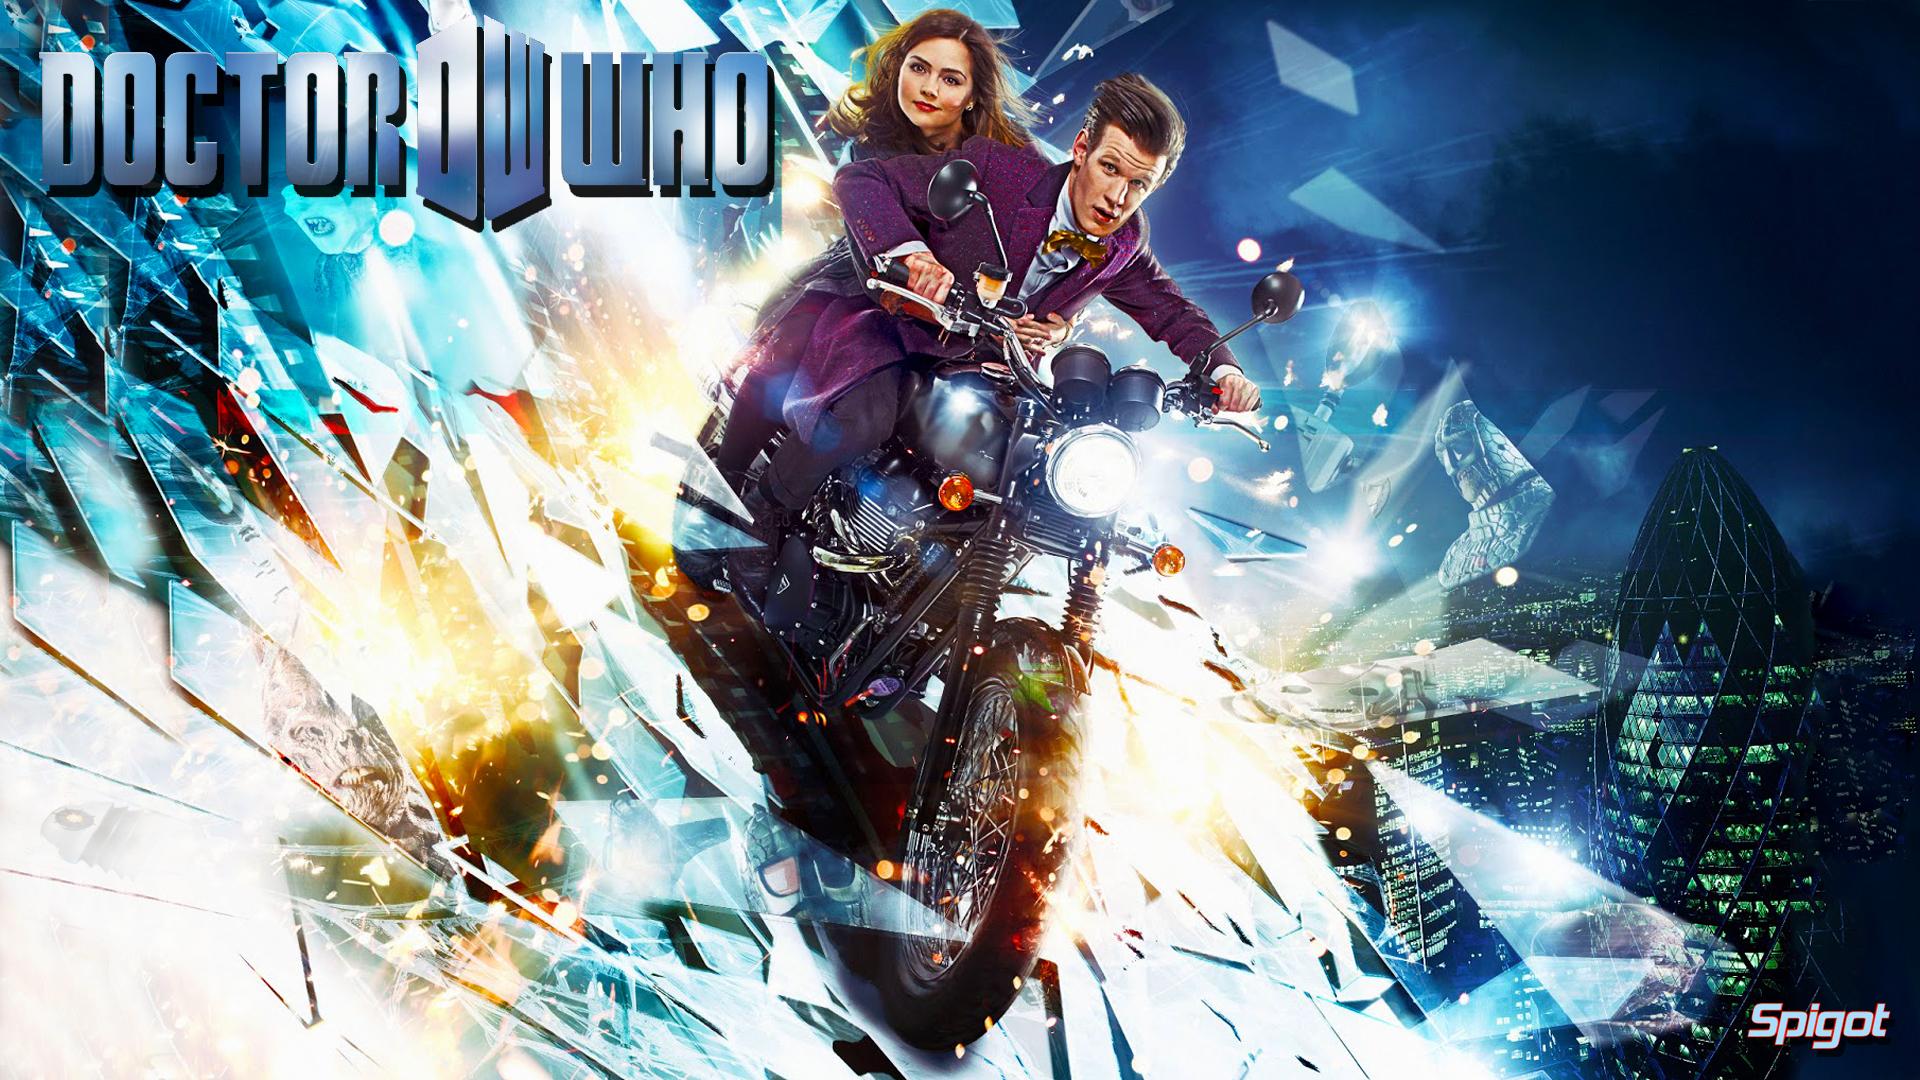 Doctor Who Season 7 Wallpaper George Spigot S Blog